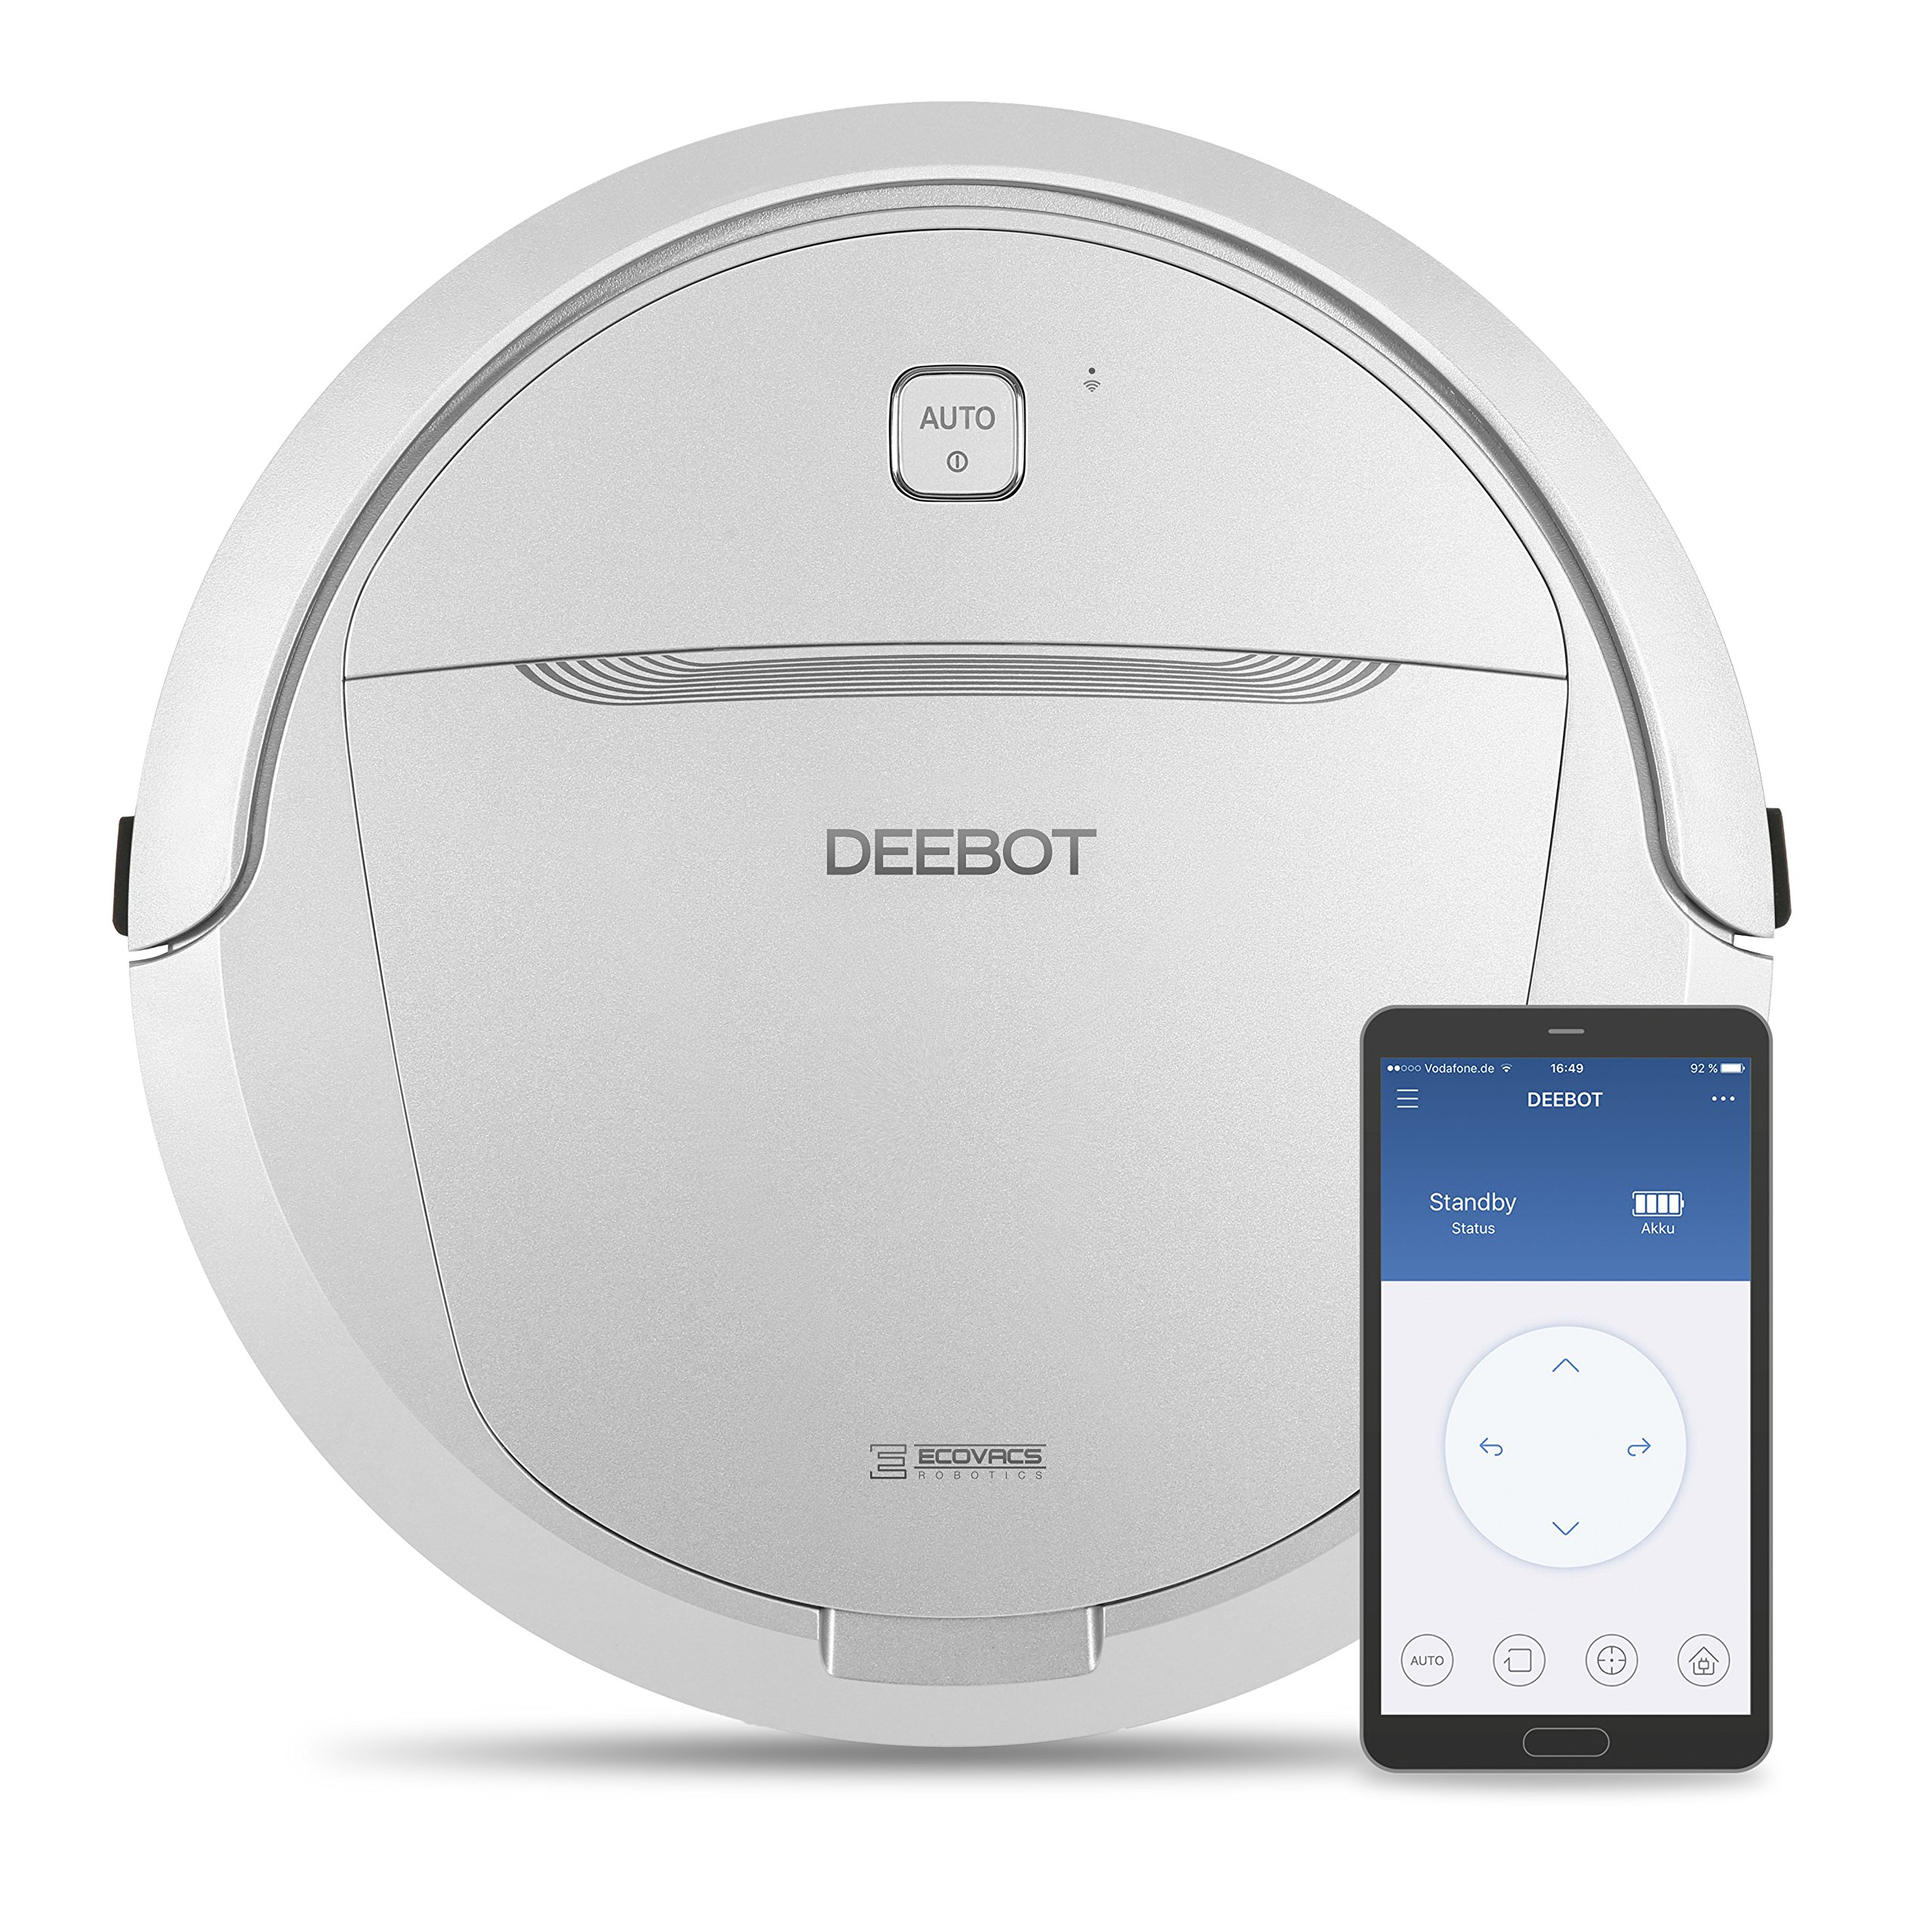 Ecovacs Deebot M81 Pro Saugroboter mit App und Alexa-Sprachsteuerung, grau